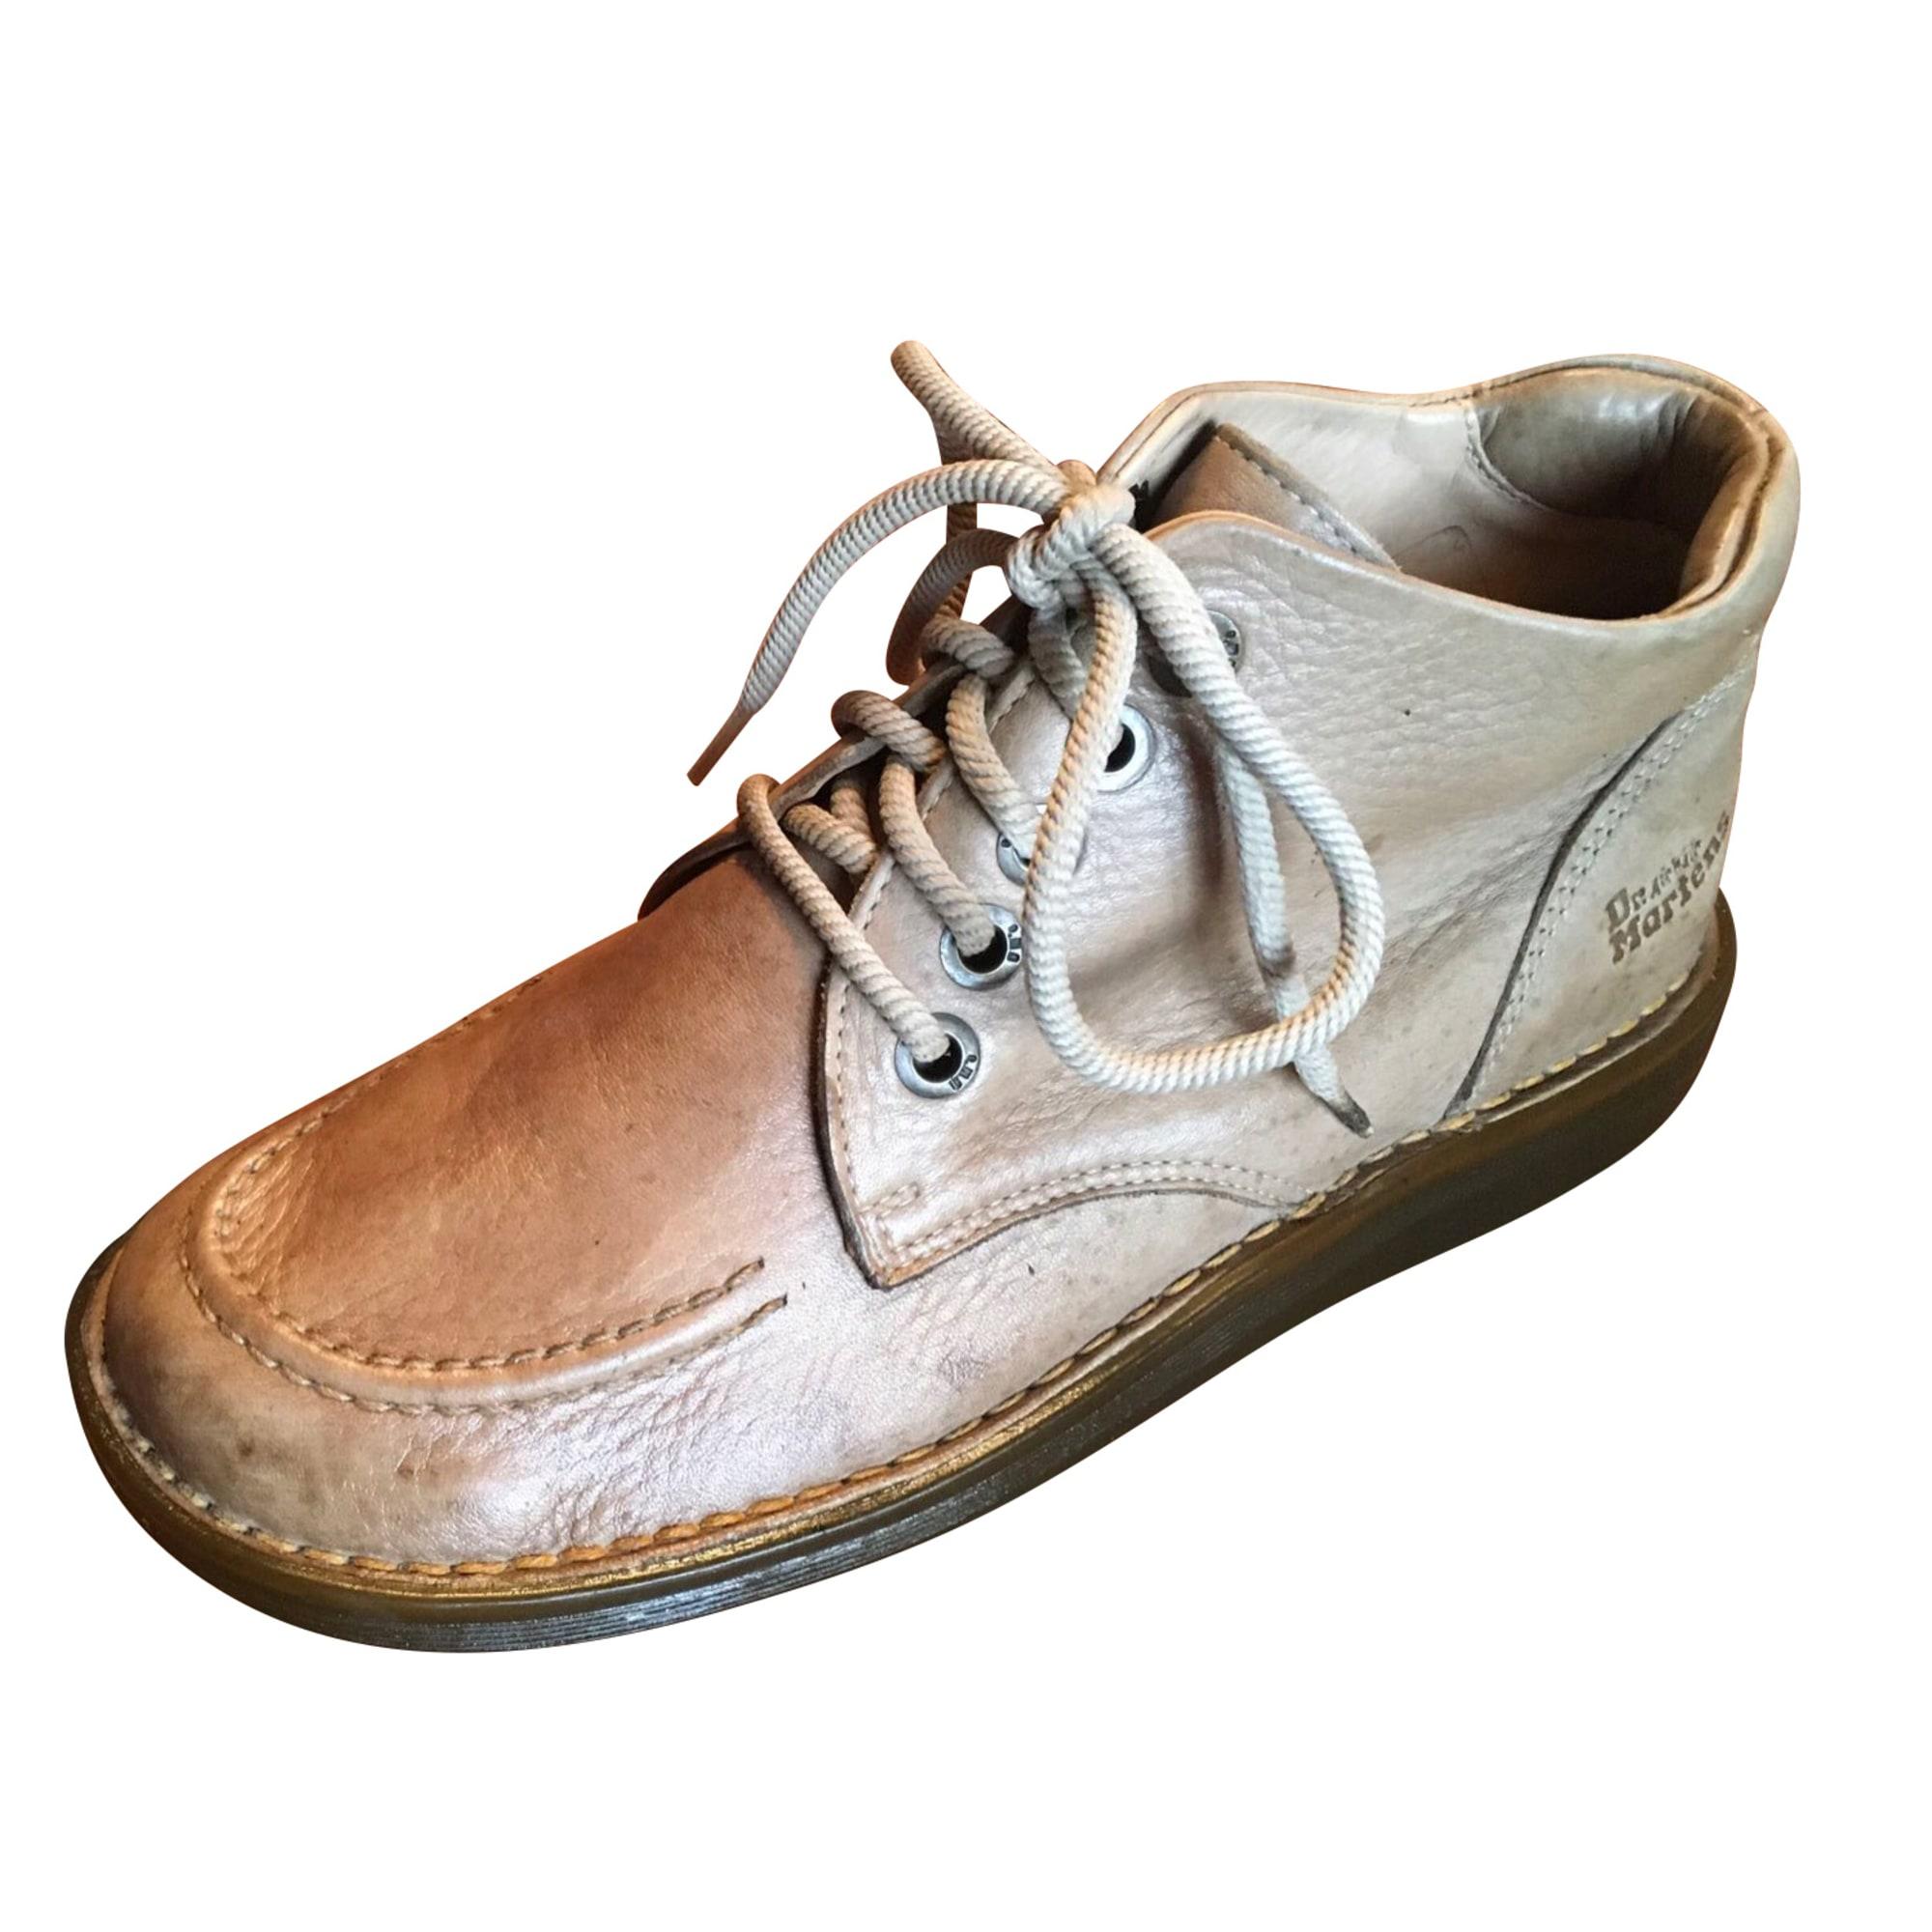 Bottines & low boots plates DR. MARTENS Beige, camel